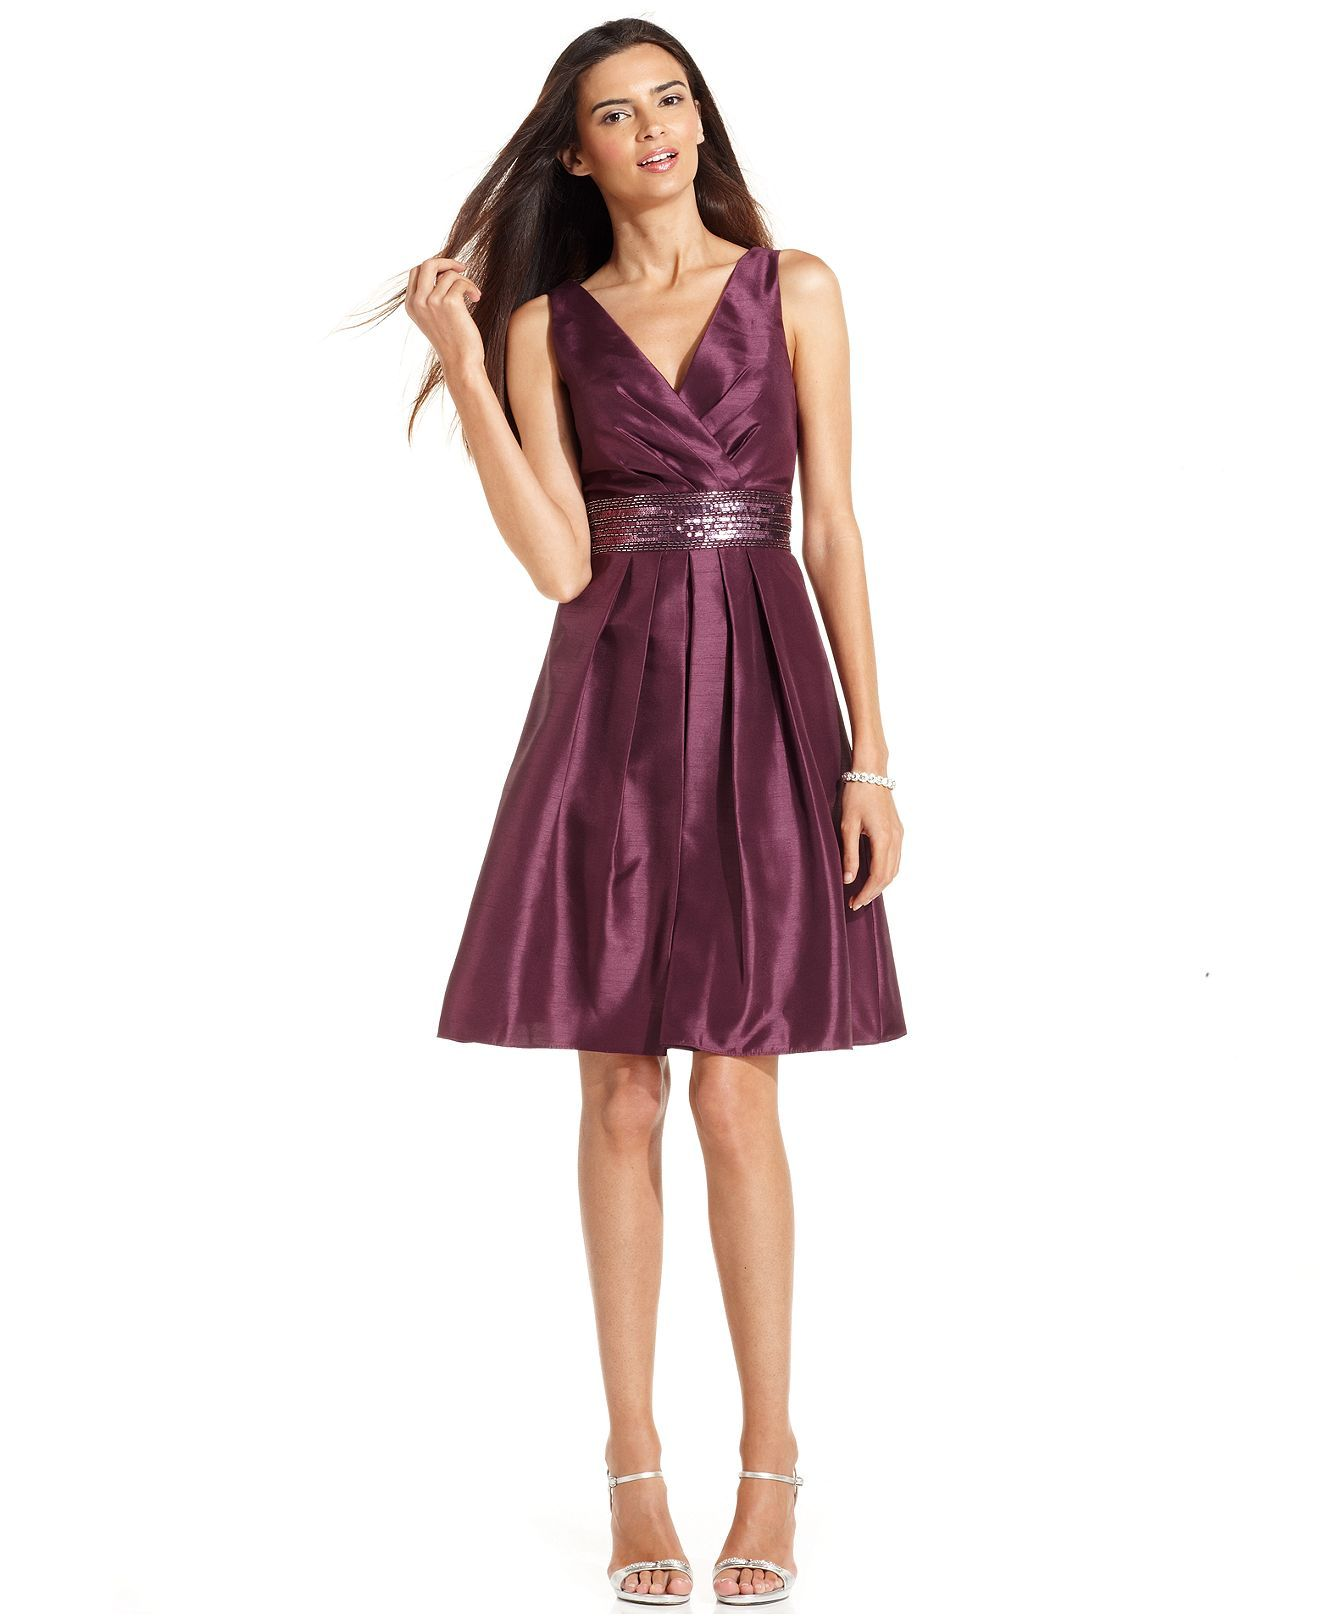 JS Boutique Dress, Sleeveless Embellished Waist - Dresses - Women - Macy's